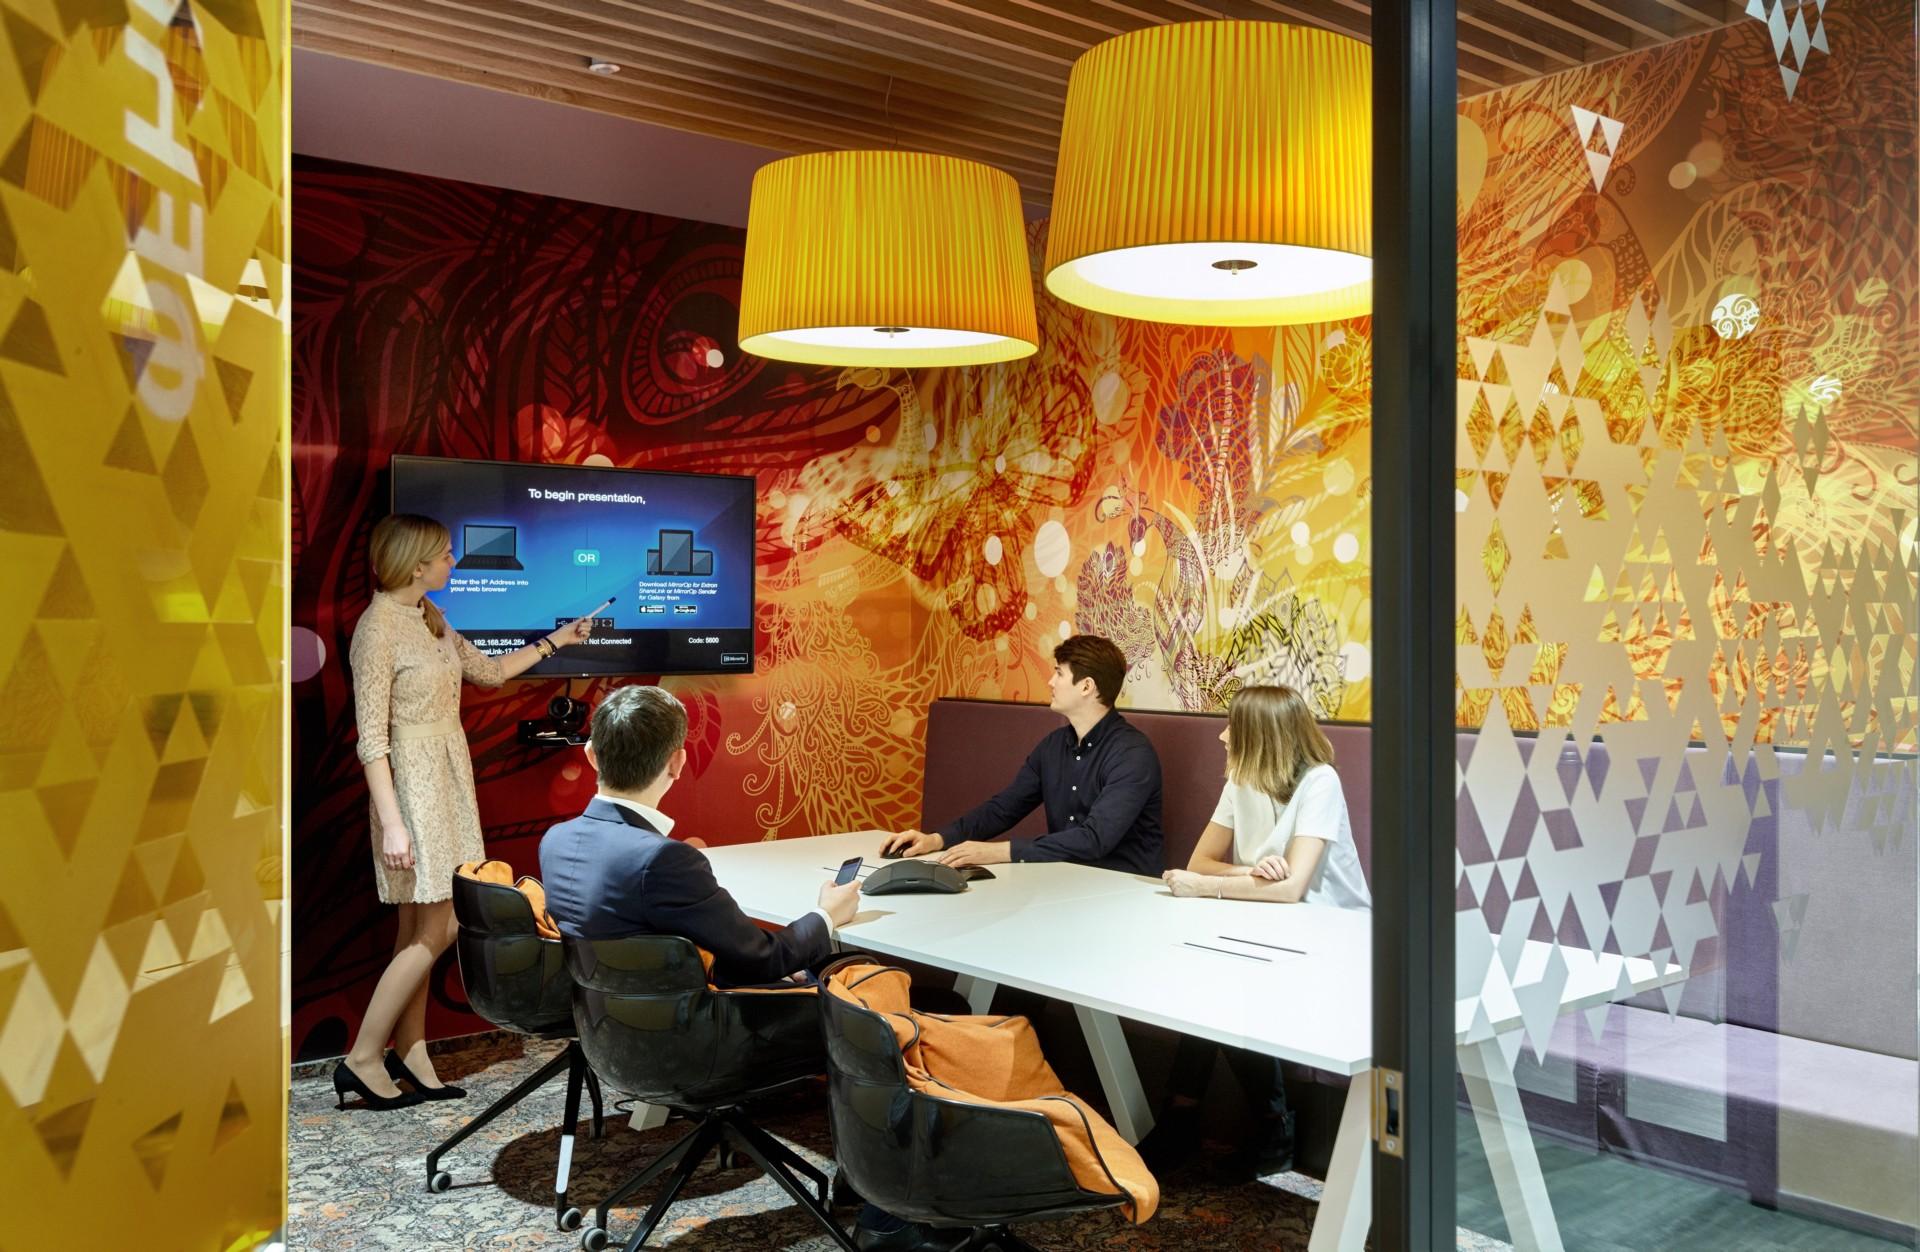 Evolution Design creates headquarters like Google's for Sberbank